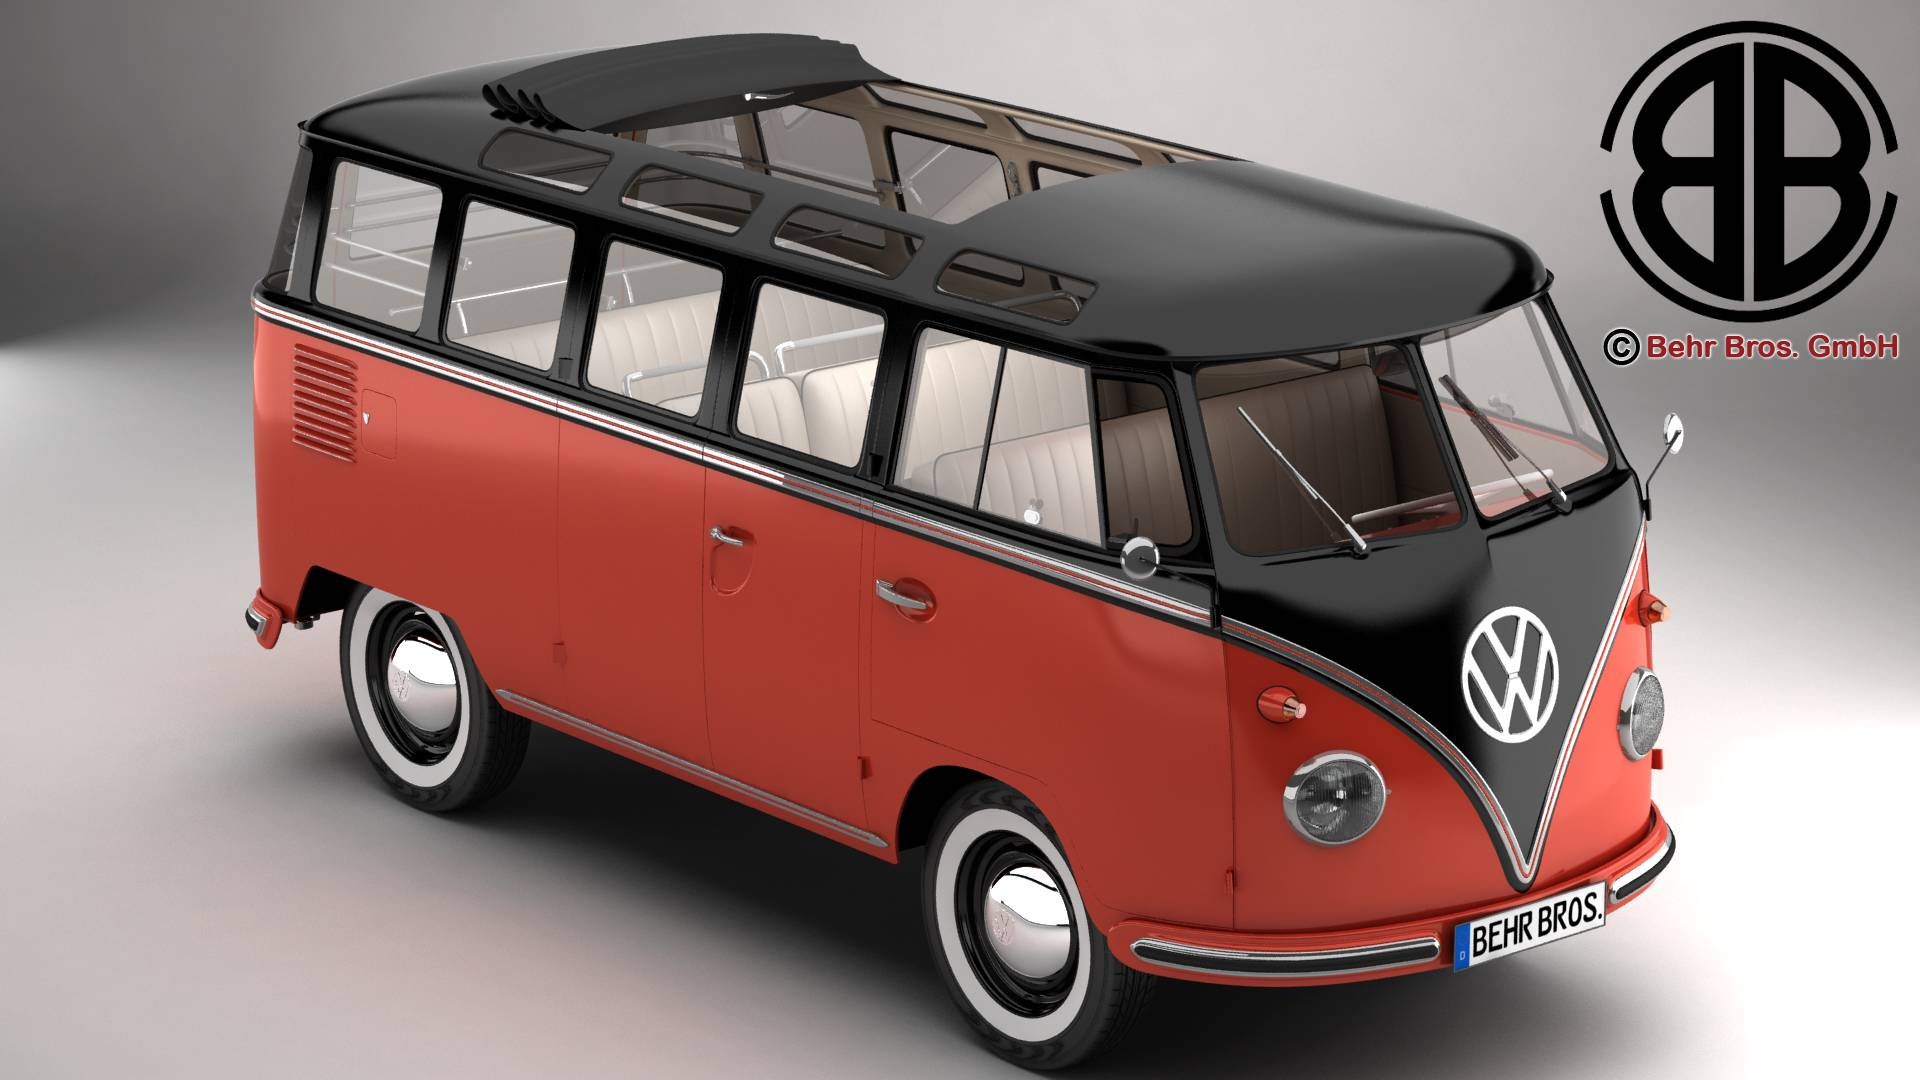 Volkswagen tegund 2 samba 1959 3d líkan 3ds hámark fbx c4d lwo ma mb obj 217104